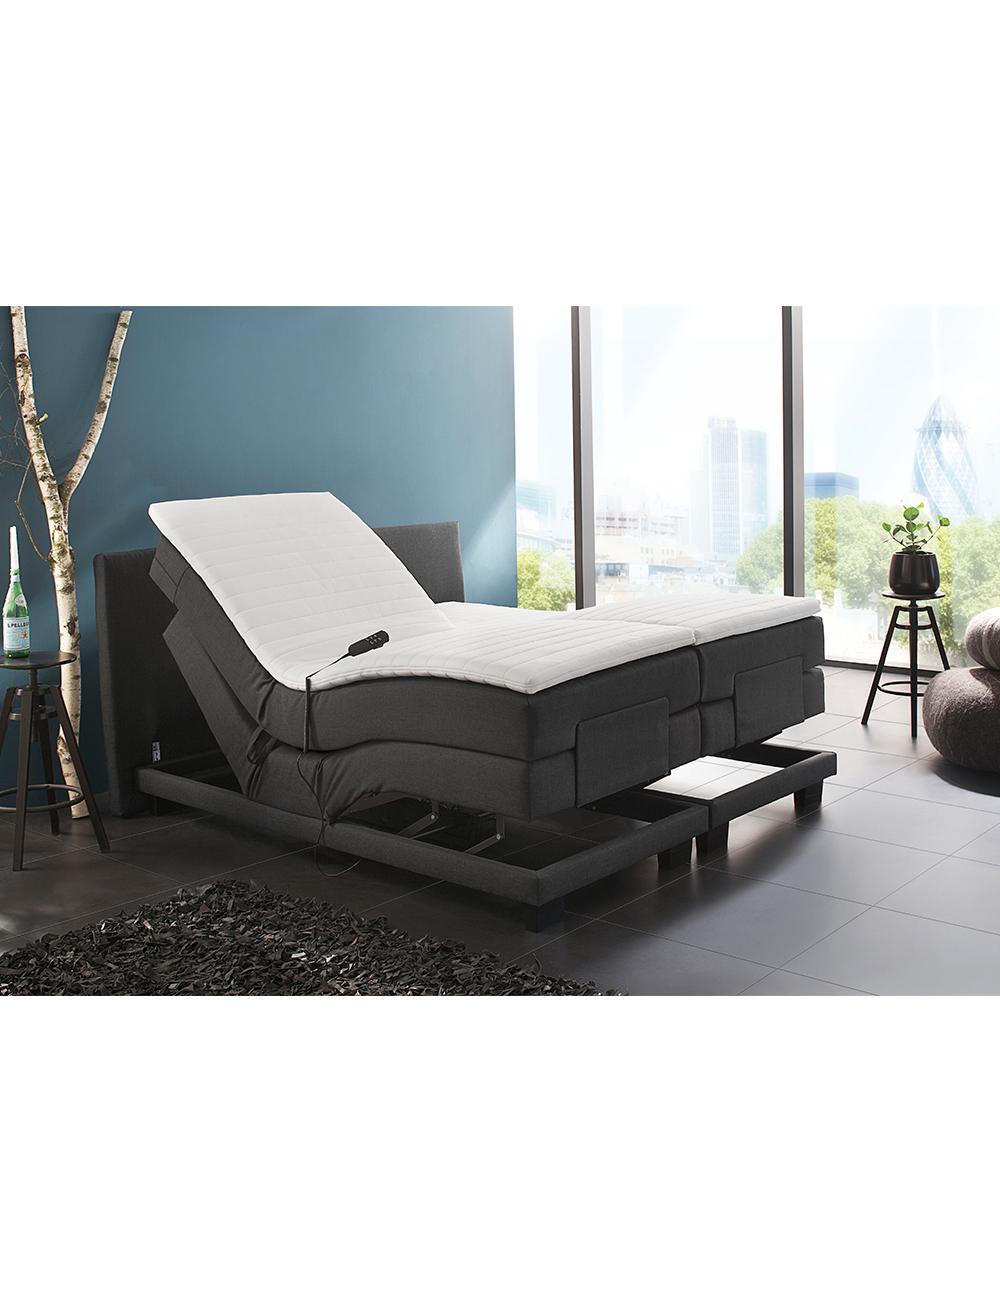 boxspringbett elektrisch s. Black Bedroom Furniture Sets. Home Design Ideas